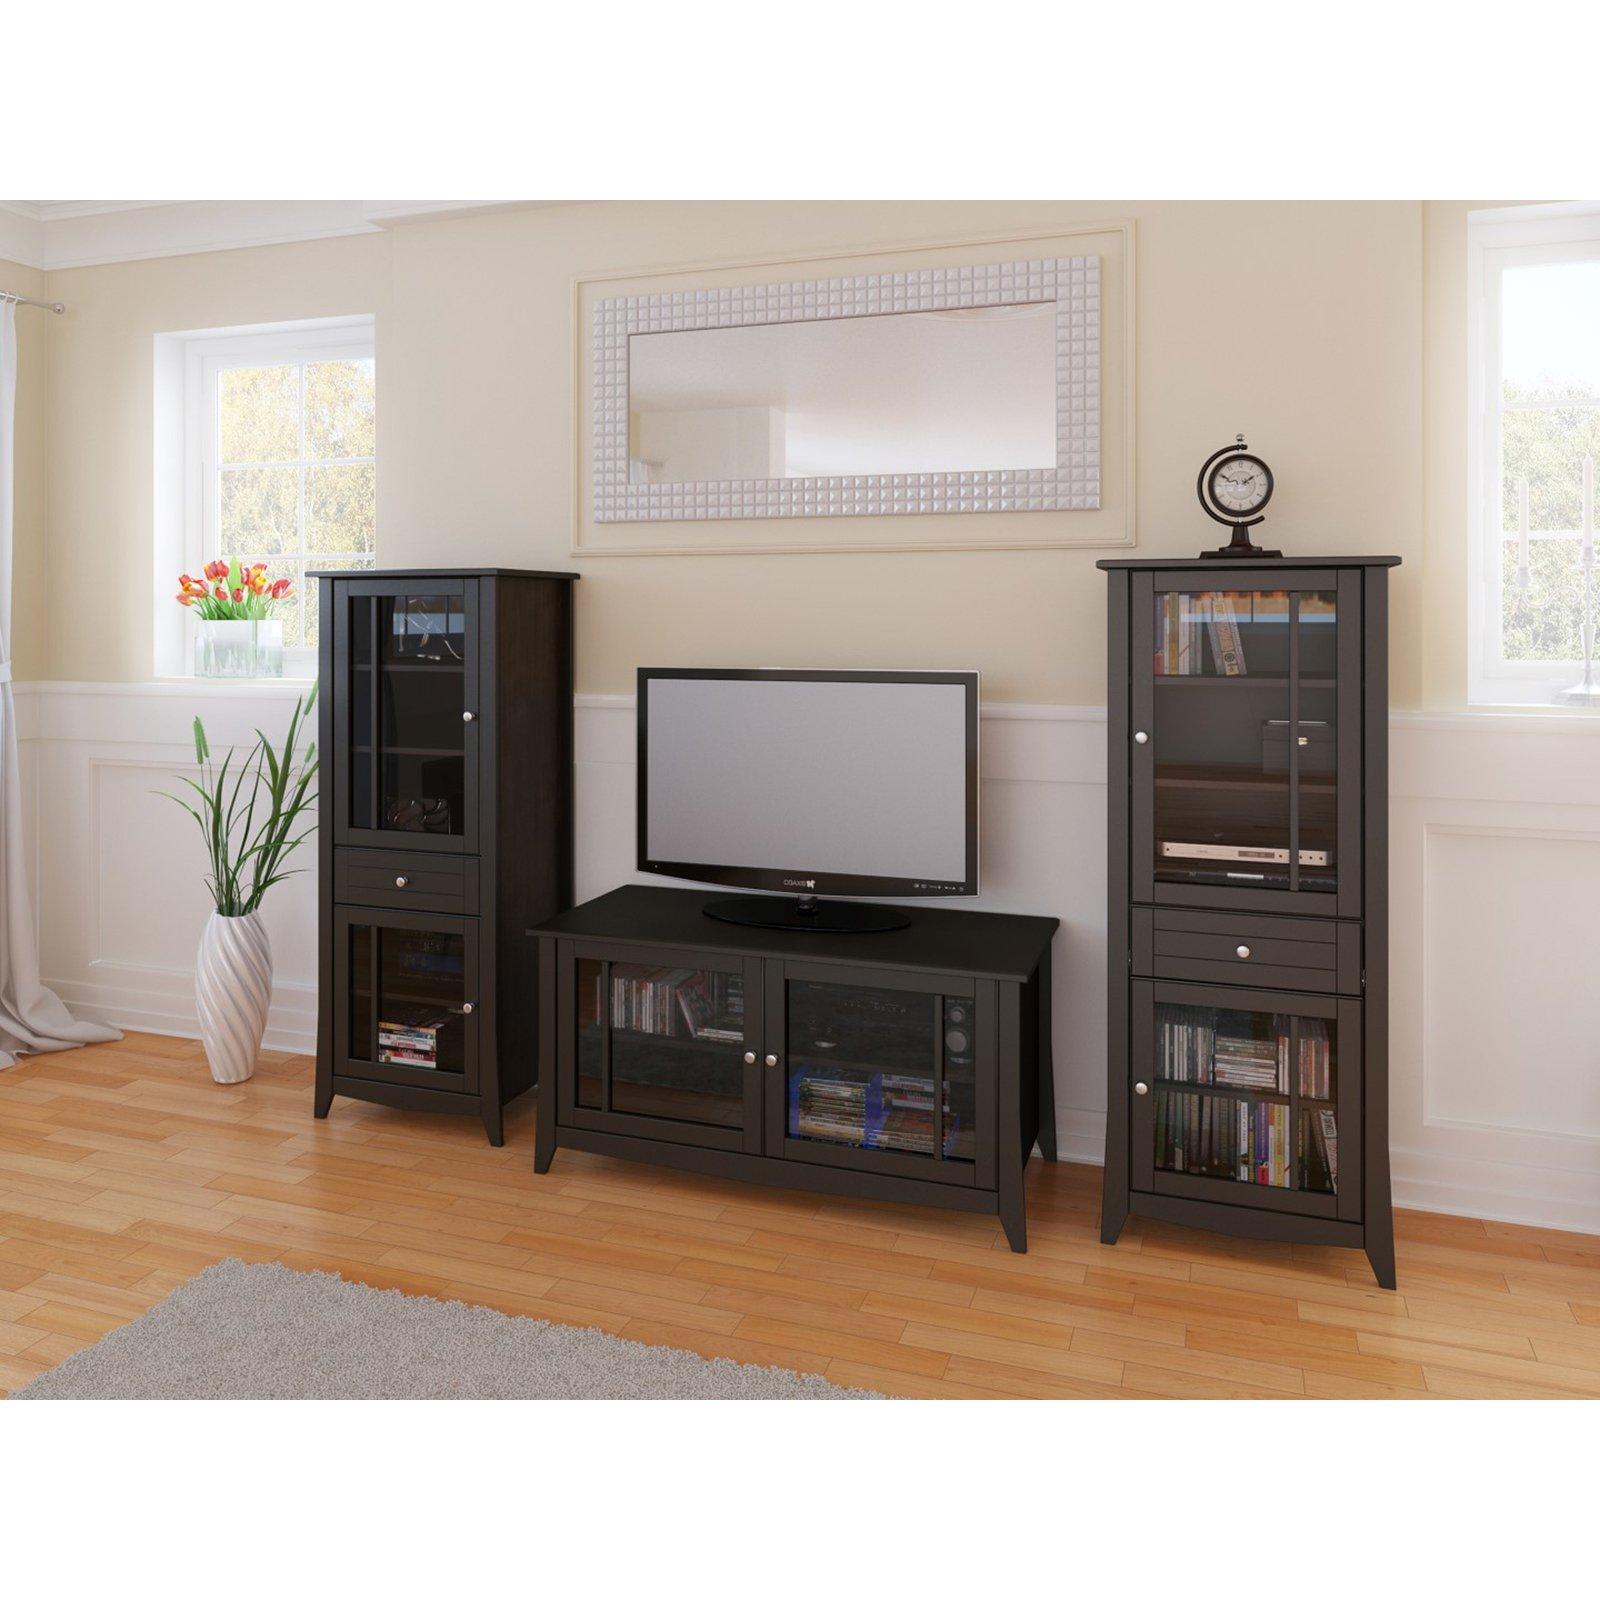 Genial TV Console With Curio Cabinet   Walmart.com